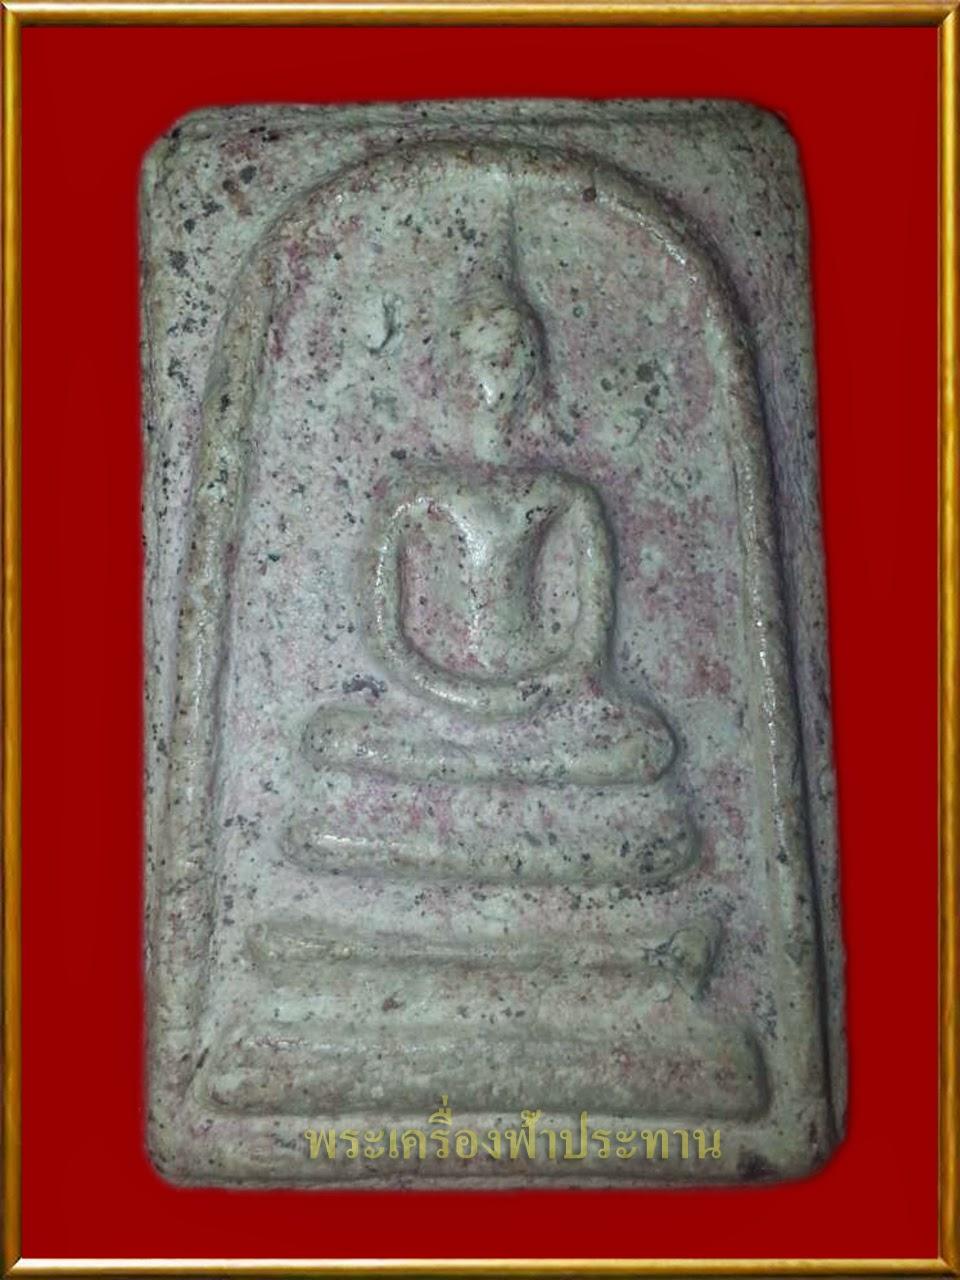 http://tubtimthong-amulet.blogspot.com/2014/11/blog-post_73.html